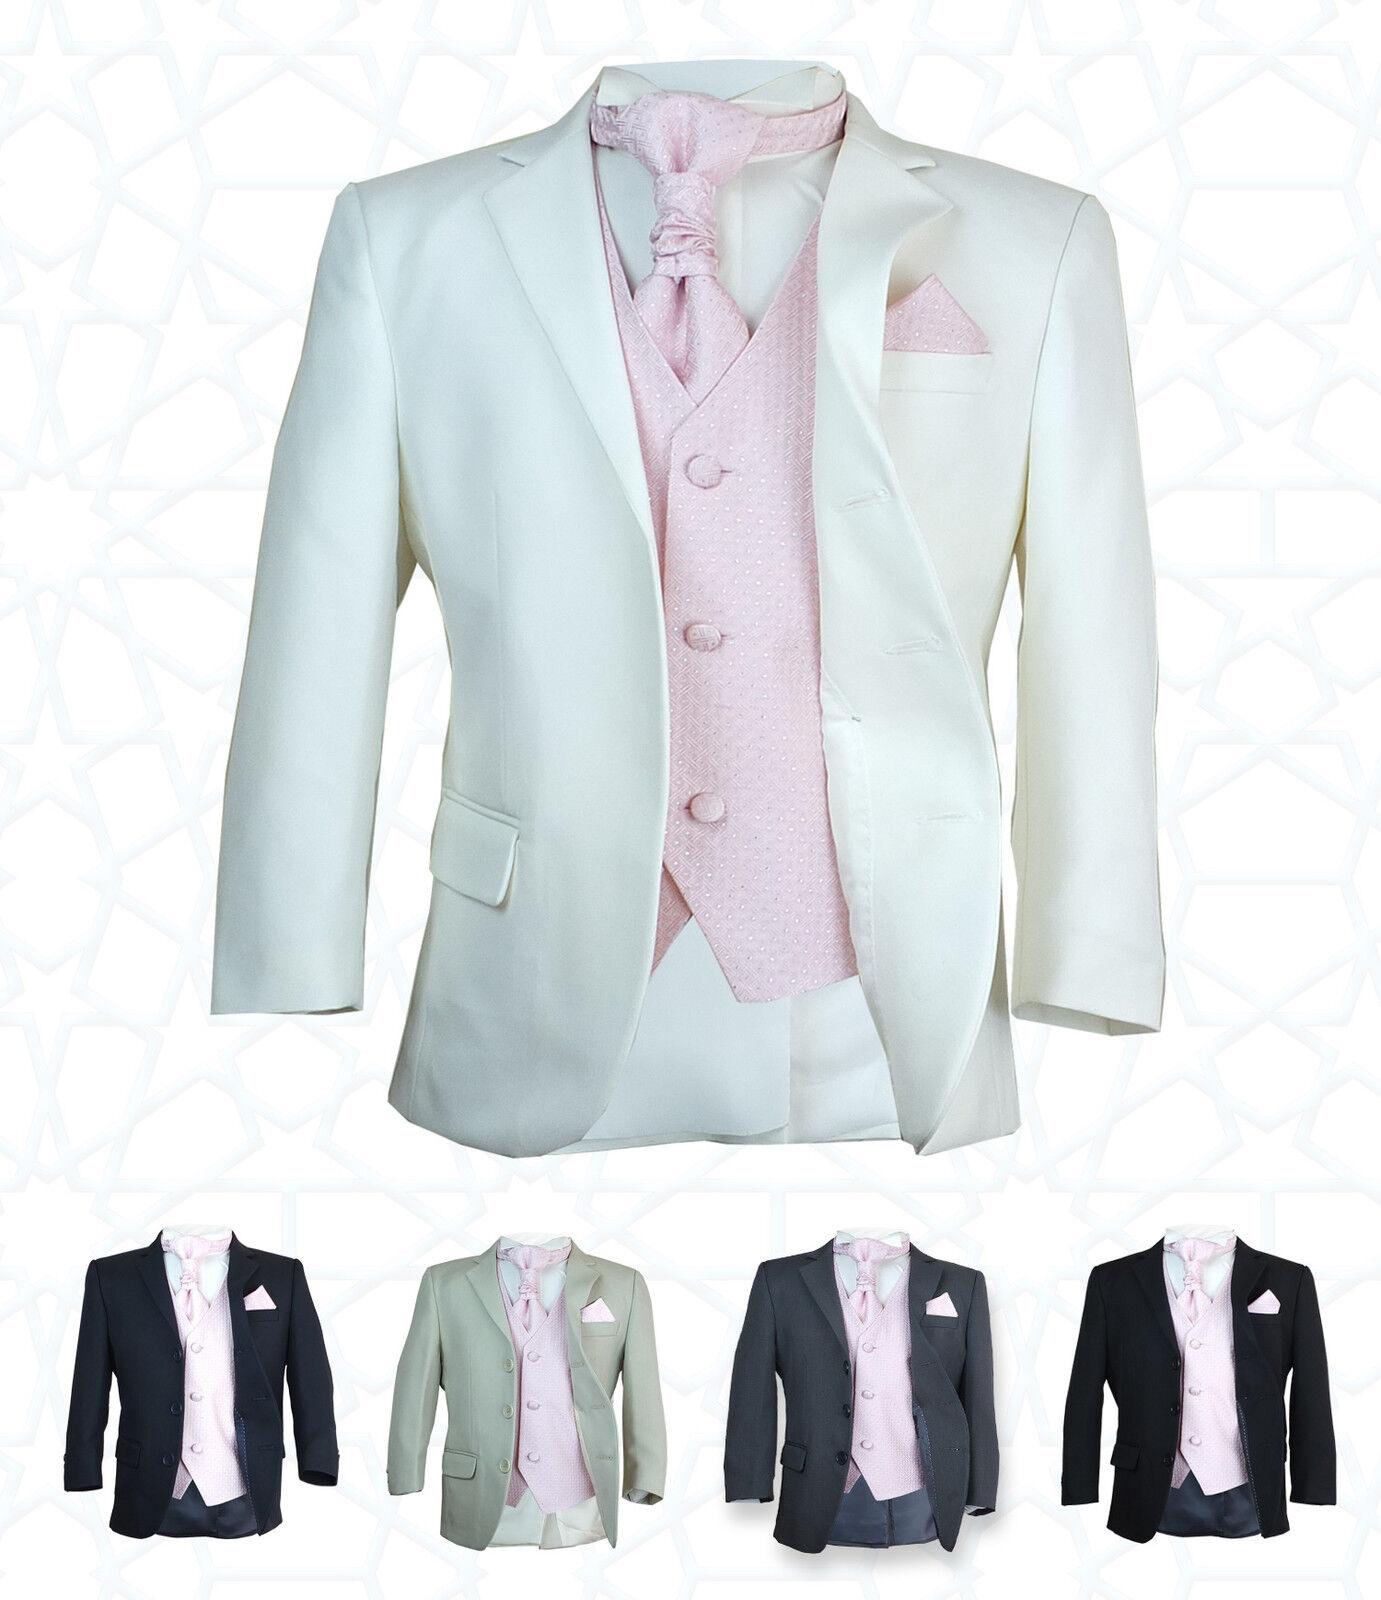 SIRRI Boys 5PC Formal Wedding Suits Pink Cravat Prom Page